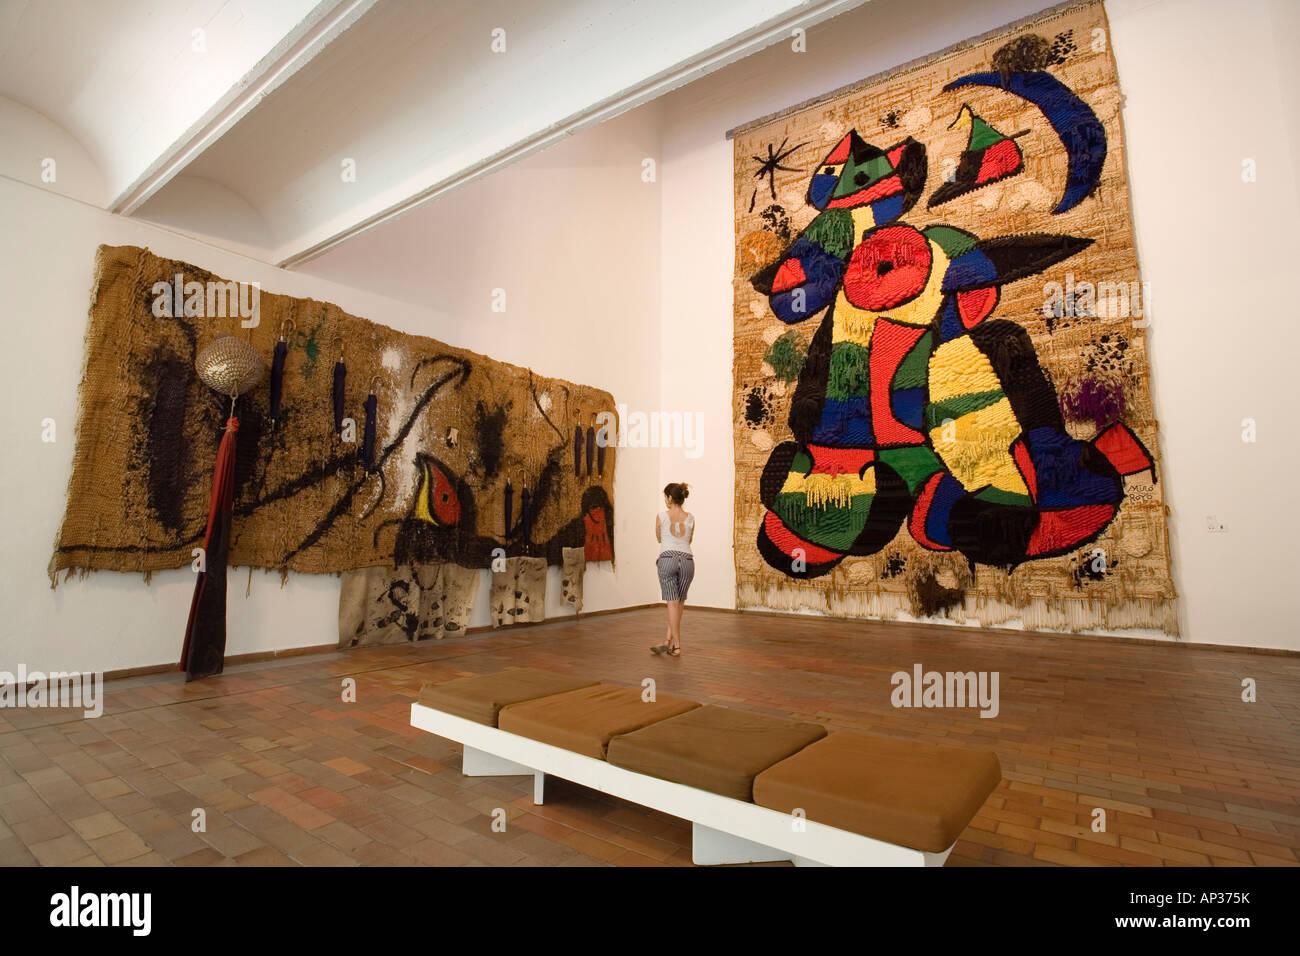 Fundacio Joan Miro, Museum, Montjuic, Barcelona, Spain Stock Photo, Royalty F...